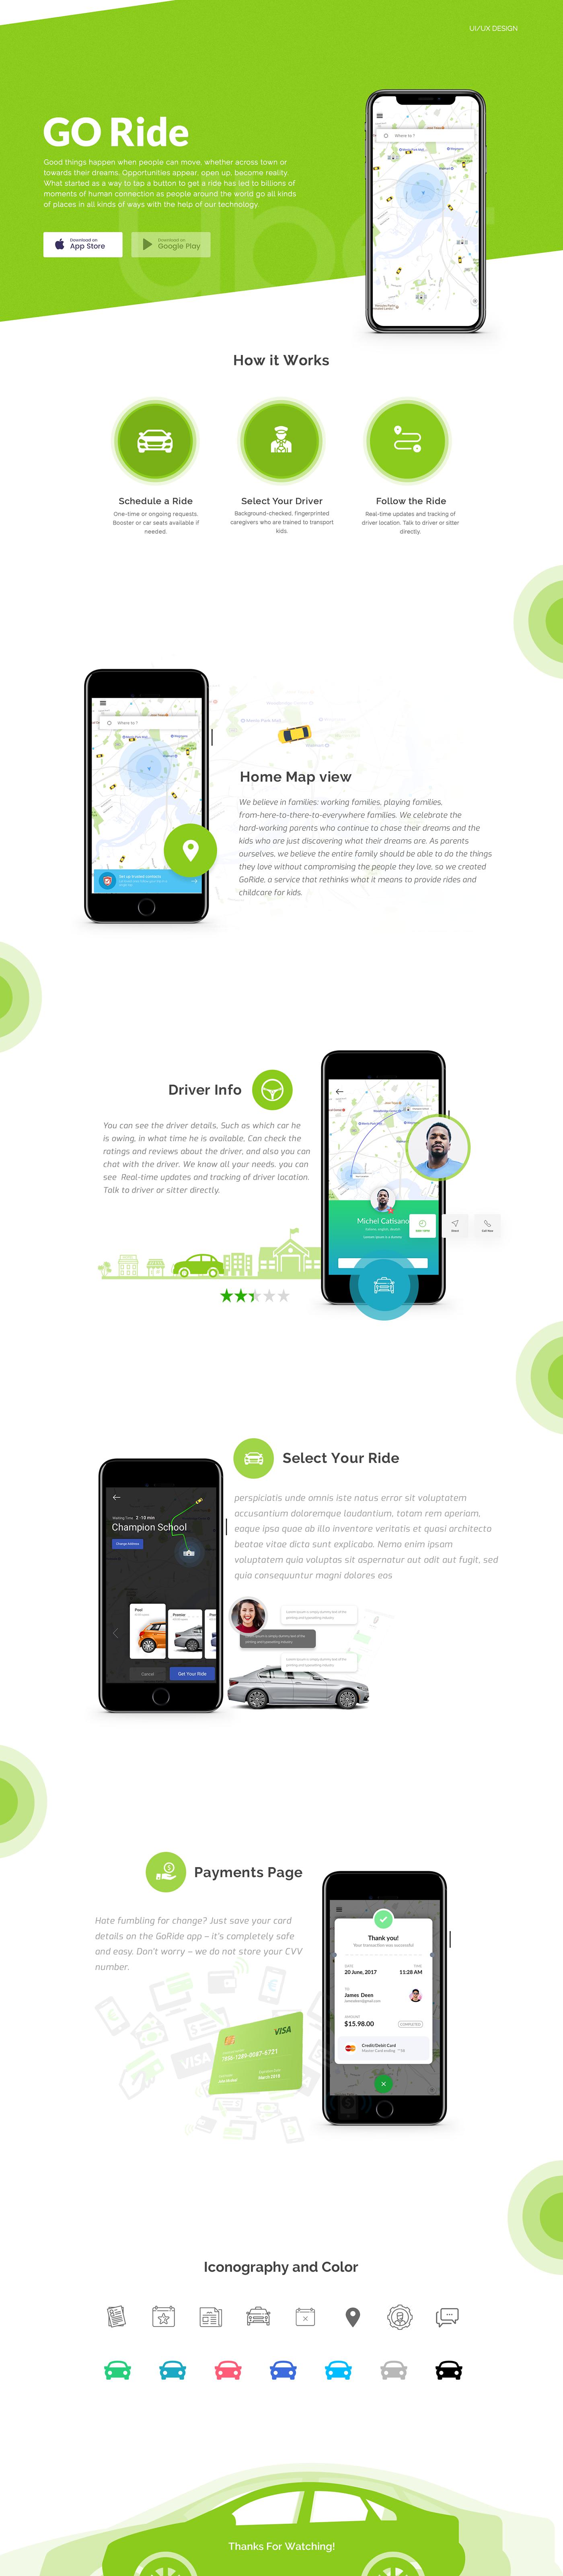 UI/UX user experience user interface graphics design Web Design  mobile design Booking Application ride booking app transportation booking app